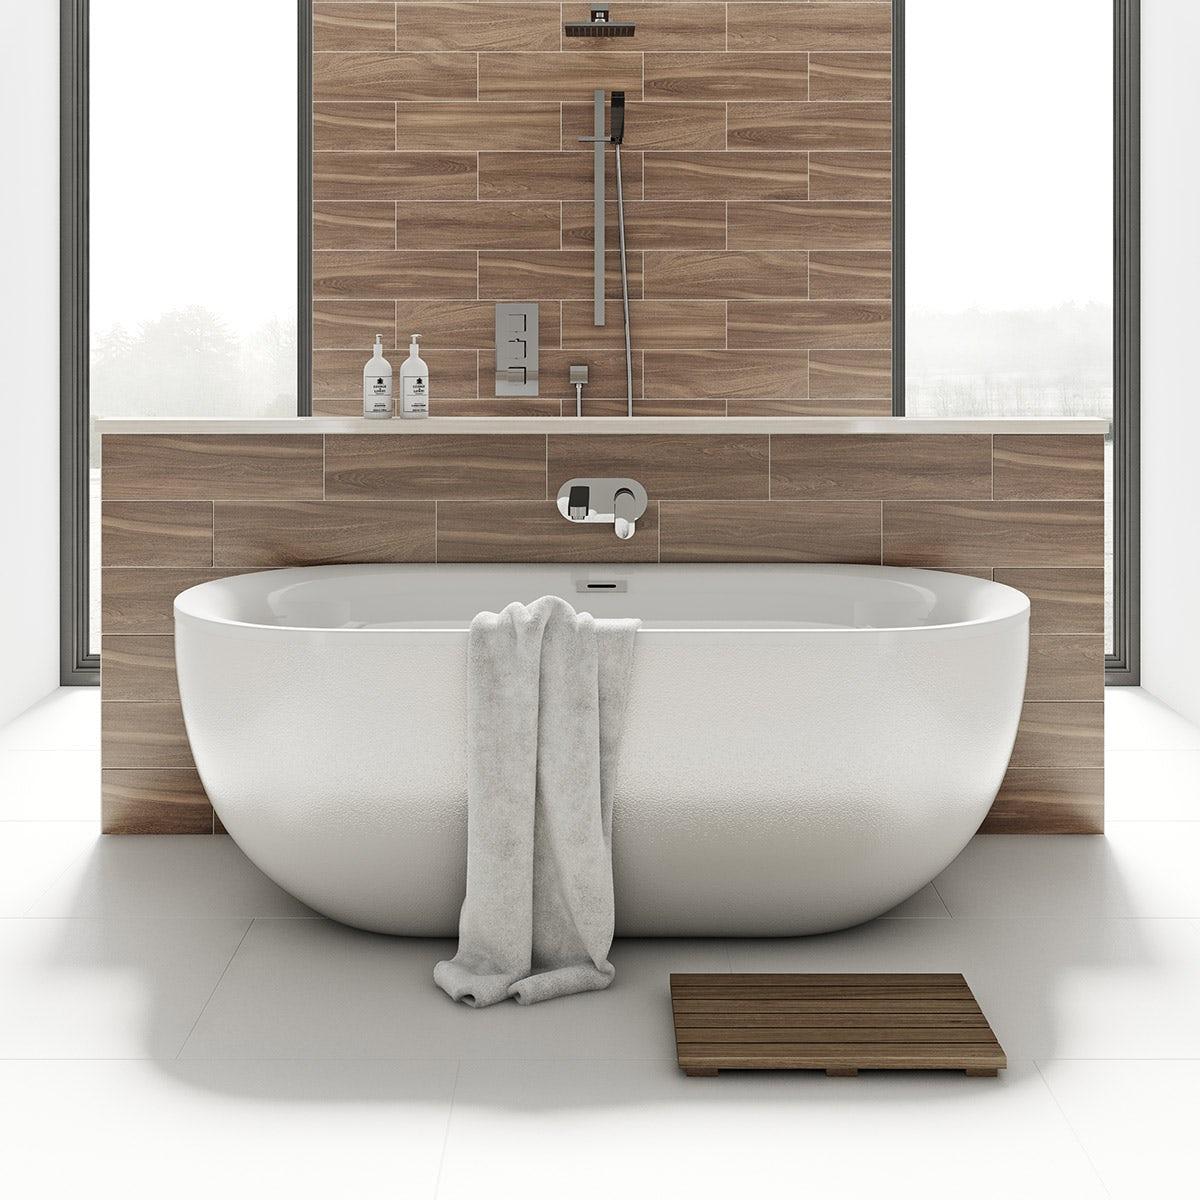 Ellis pearl coloured freestanding bath